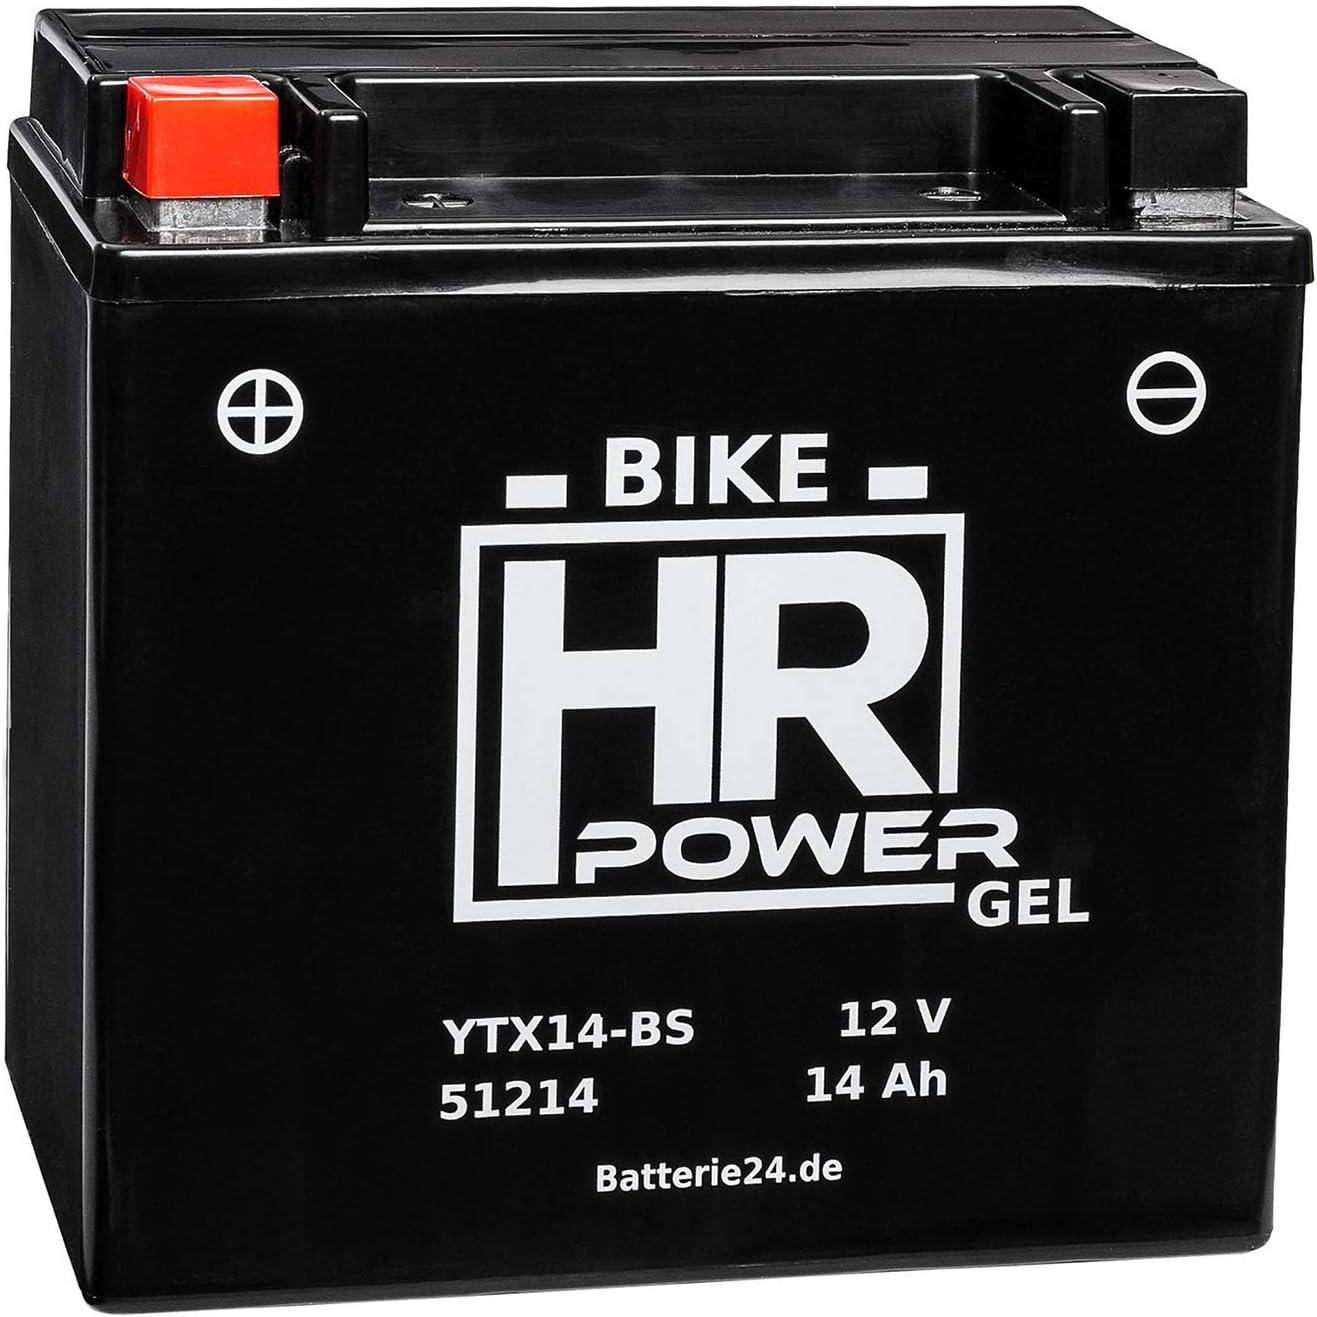 Gel Motorrad Batterie Starterbatterie Ytx14 Bs 51214 12v 14ah Wartungsfrei Auto